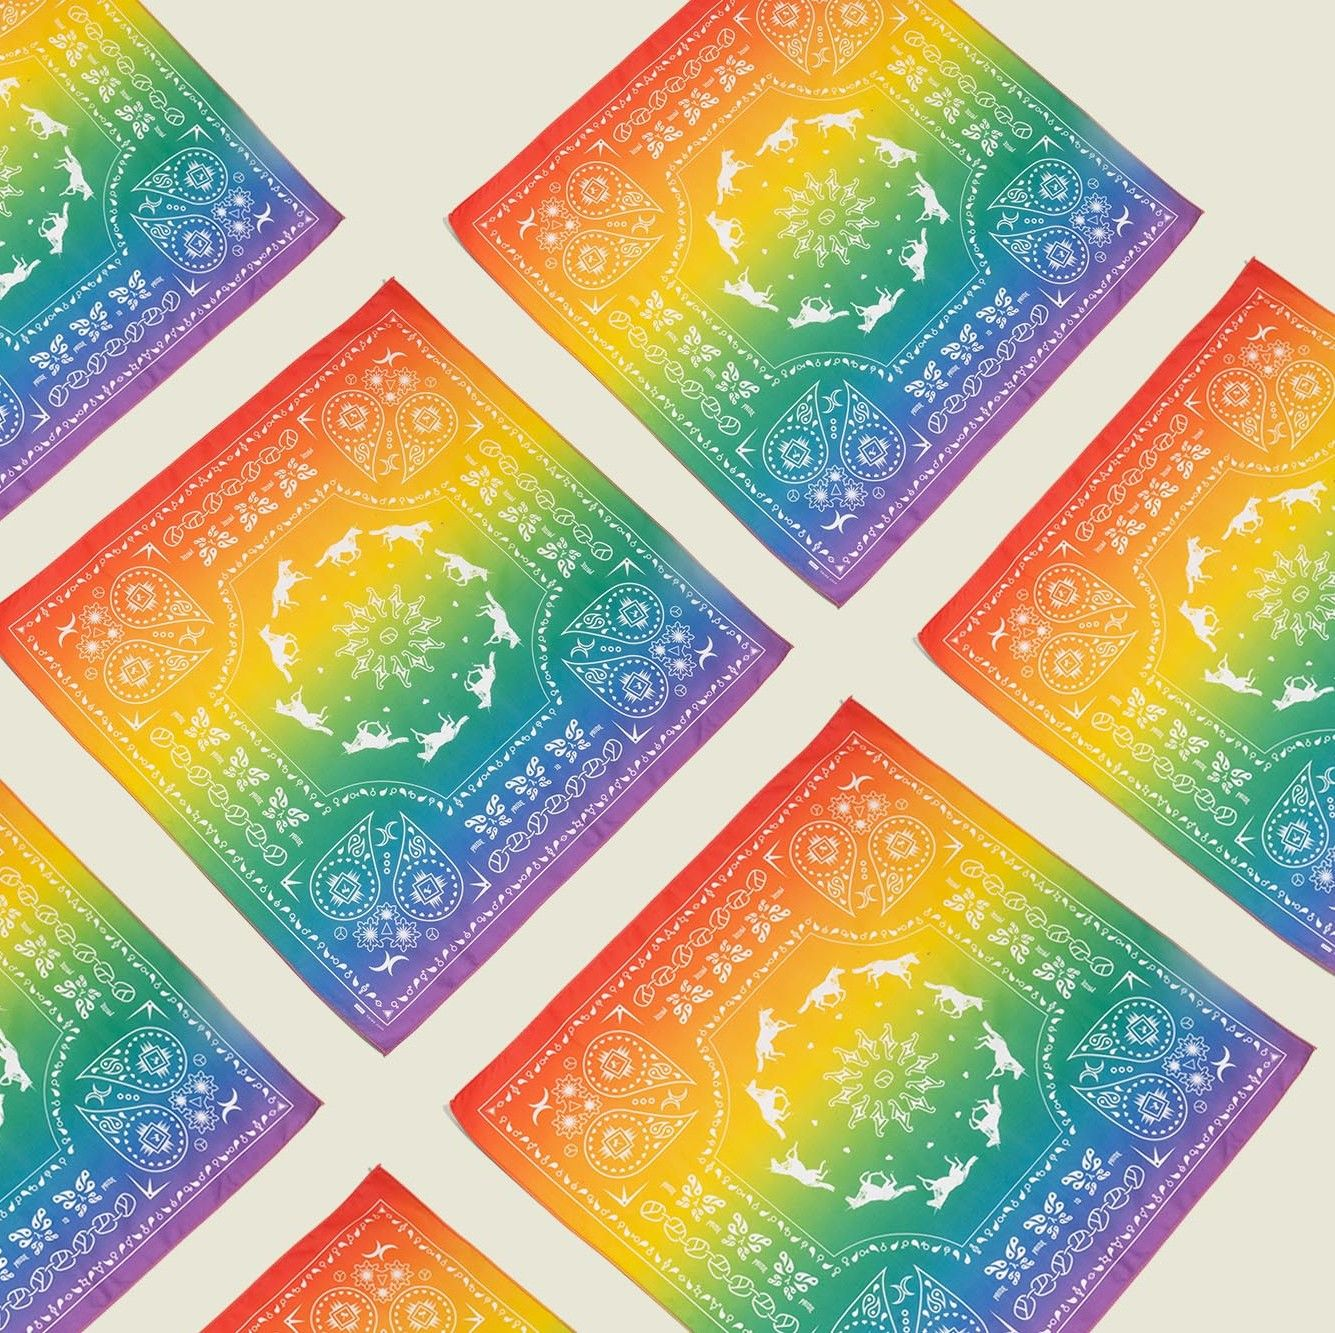 Colorful handkerchiefs